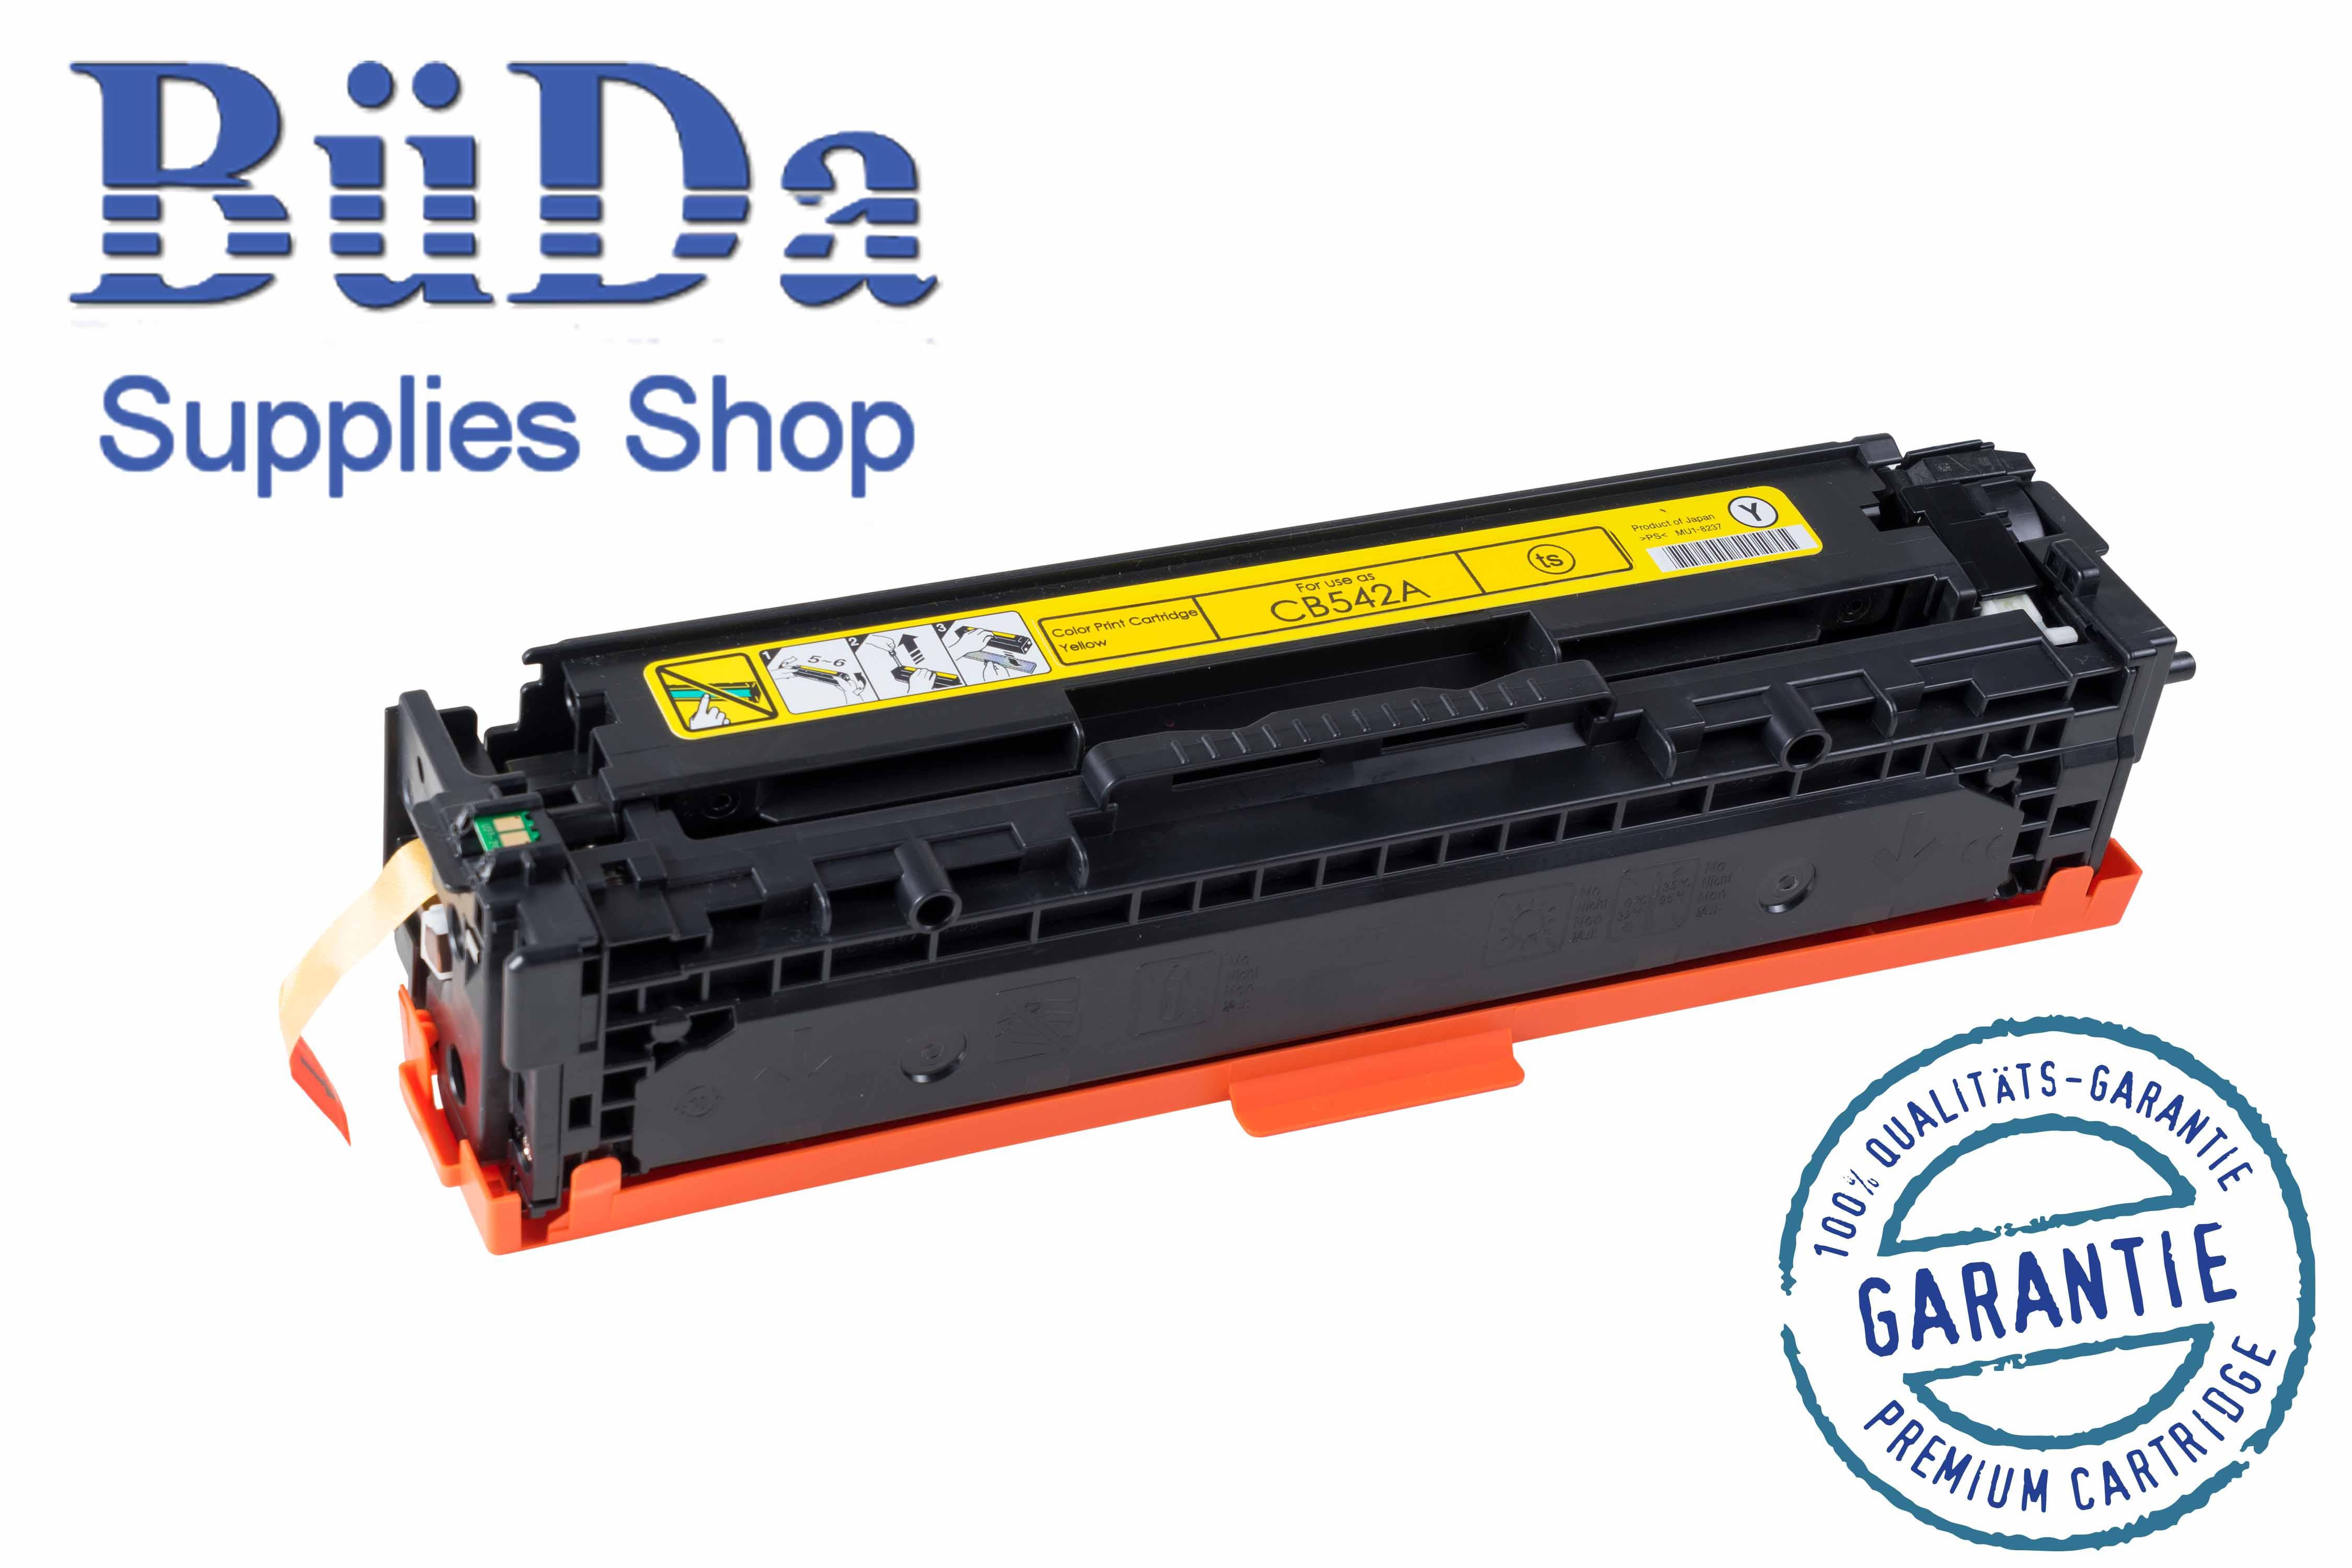 Toner-Modul komp. zu CB542A / Crt. 716Y yellow 1400 Seiten